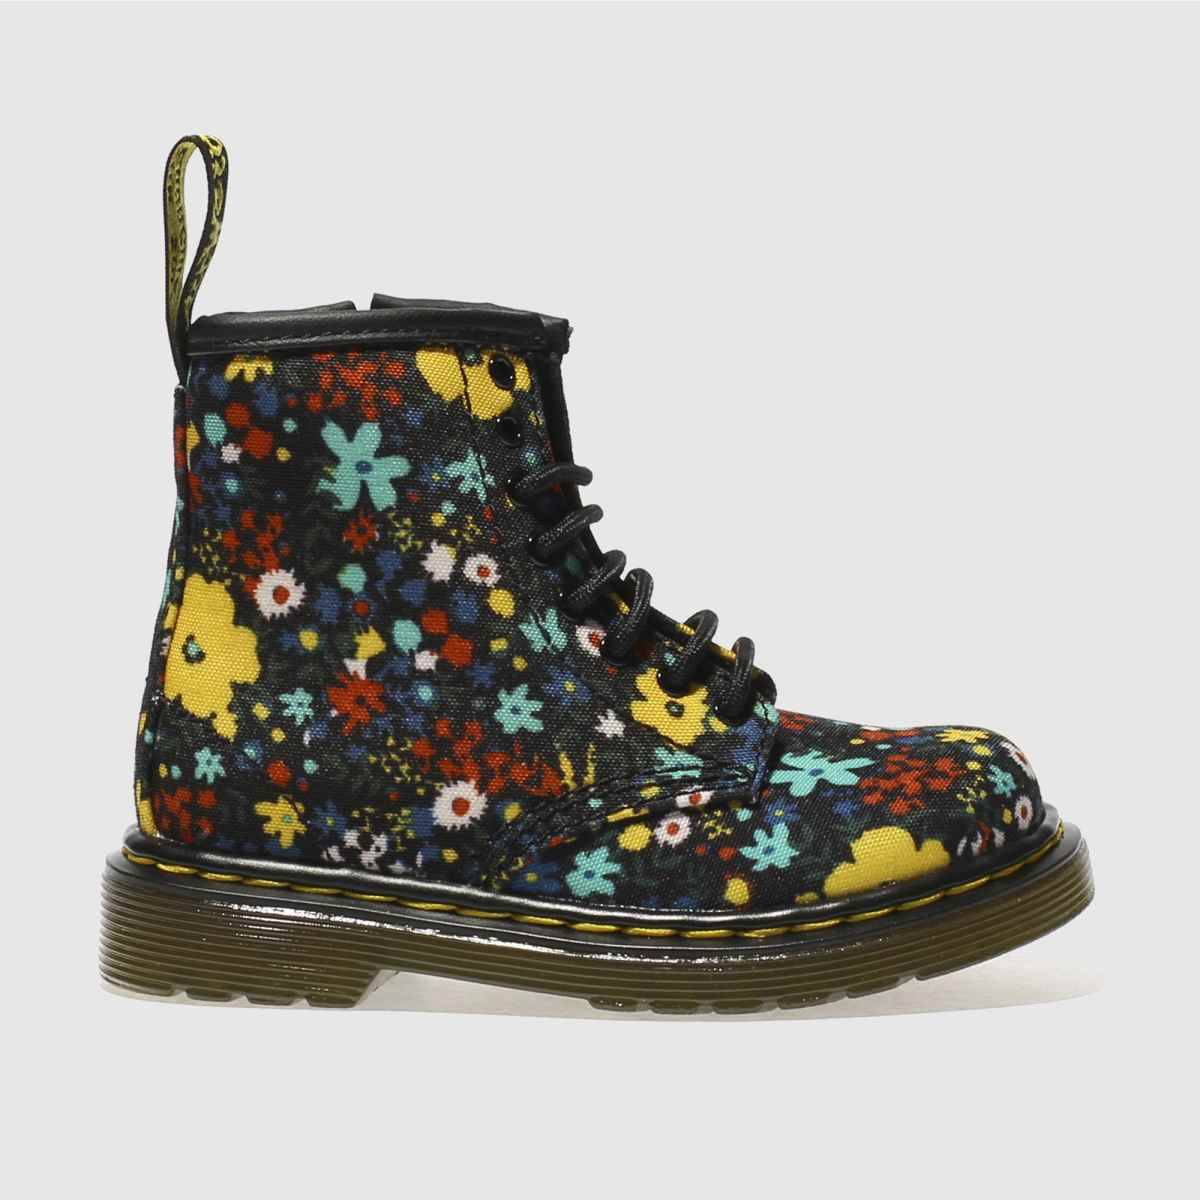 Dr Martens Black & Yellow 146o Wanderflora Girls Toddler Boots